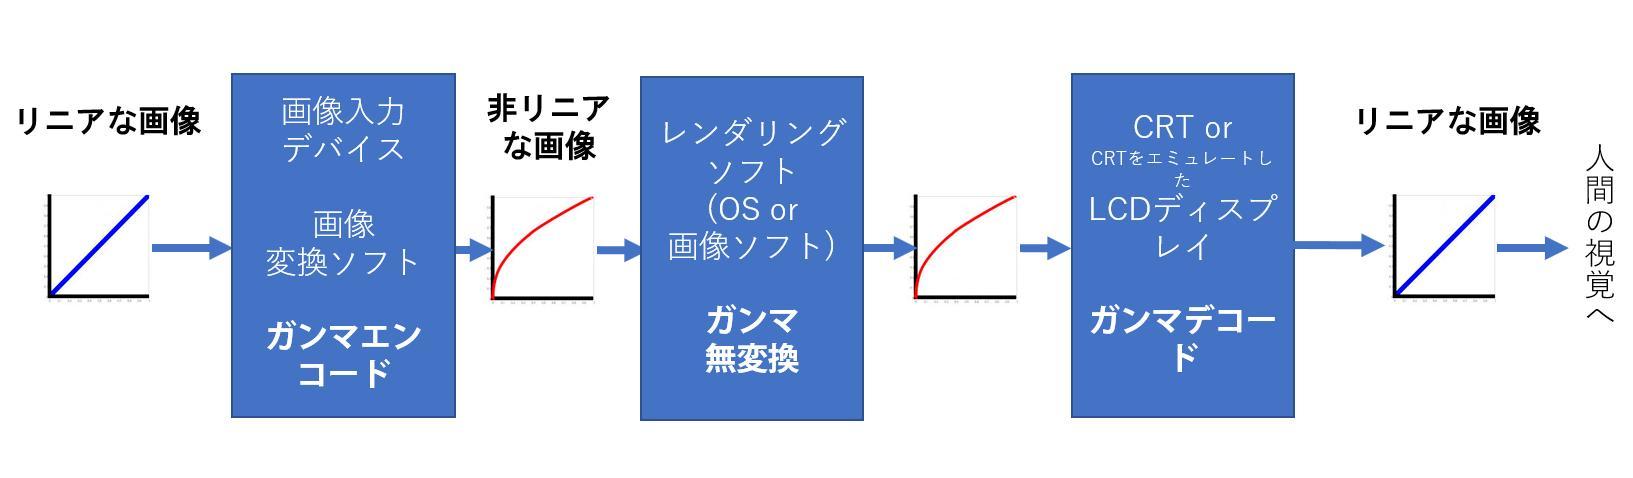 f:id:yasuo_ssi:20201106110229j:plain